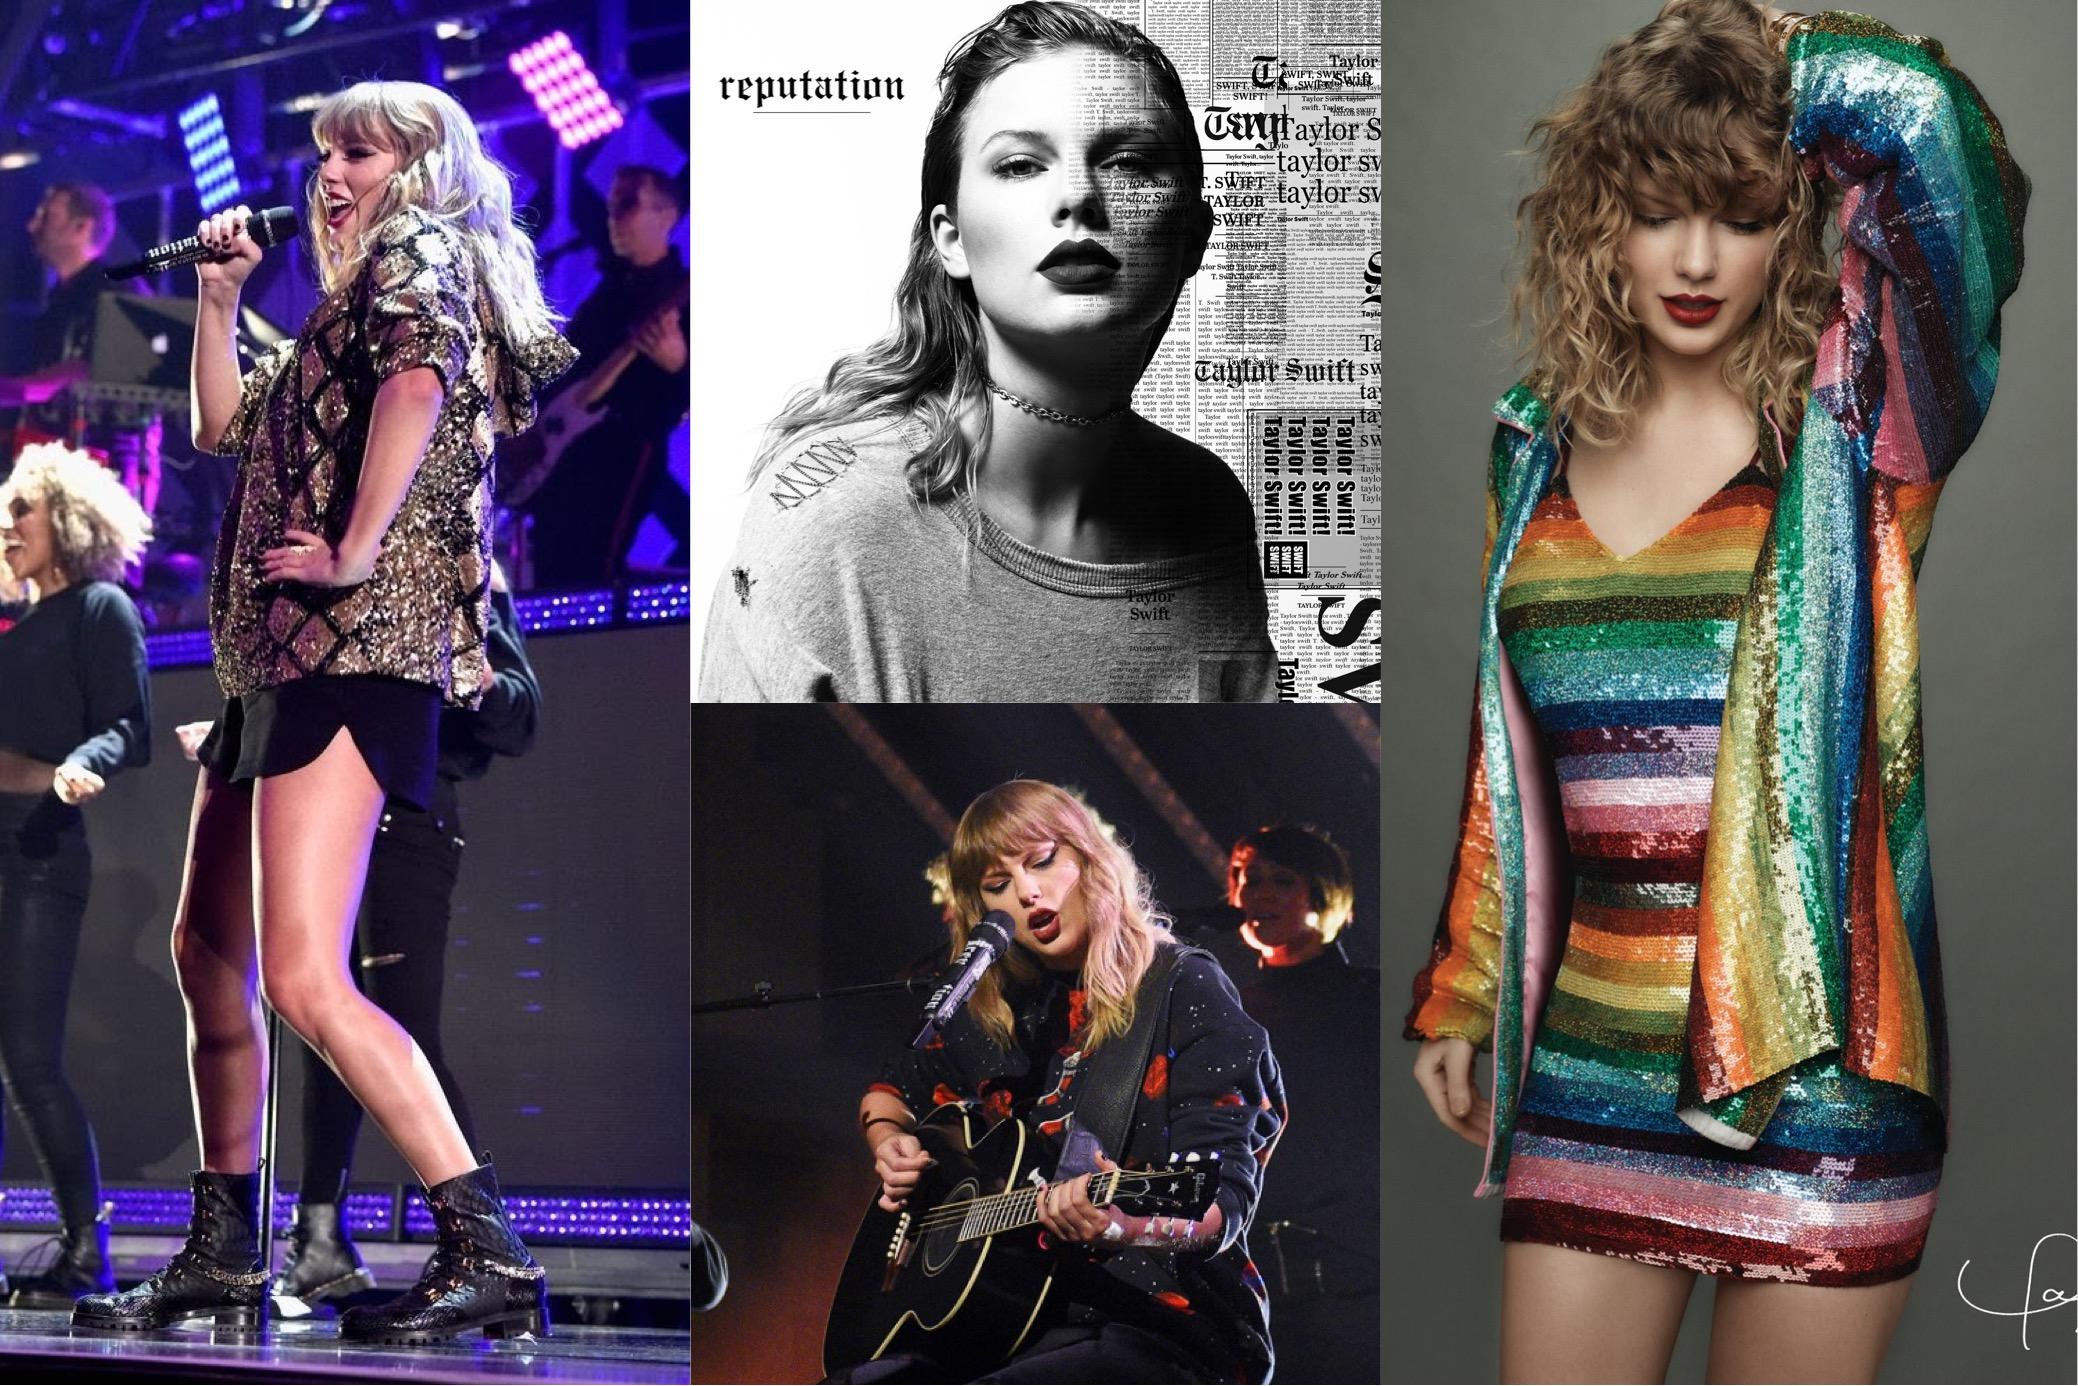 "Taylor Swift at the 2017 KIIS-FM Jingle Ball,  reputation  (2017) album cover, on  Saturday Night Live  season 43, episode 5 ""Tiffany Haddish/Taylor Swift"" (2017), reputation (2017) Target exclusive Magazine Vol. 2   (Photo:  Getty Images, Billboard, Tumblr, Facebook.com/TaylorSwift )"